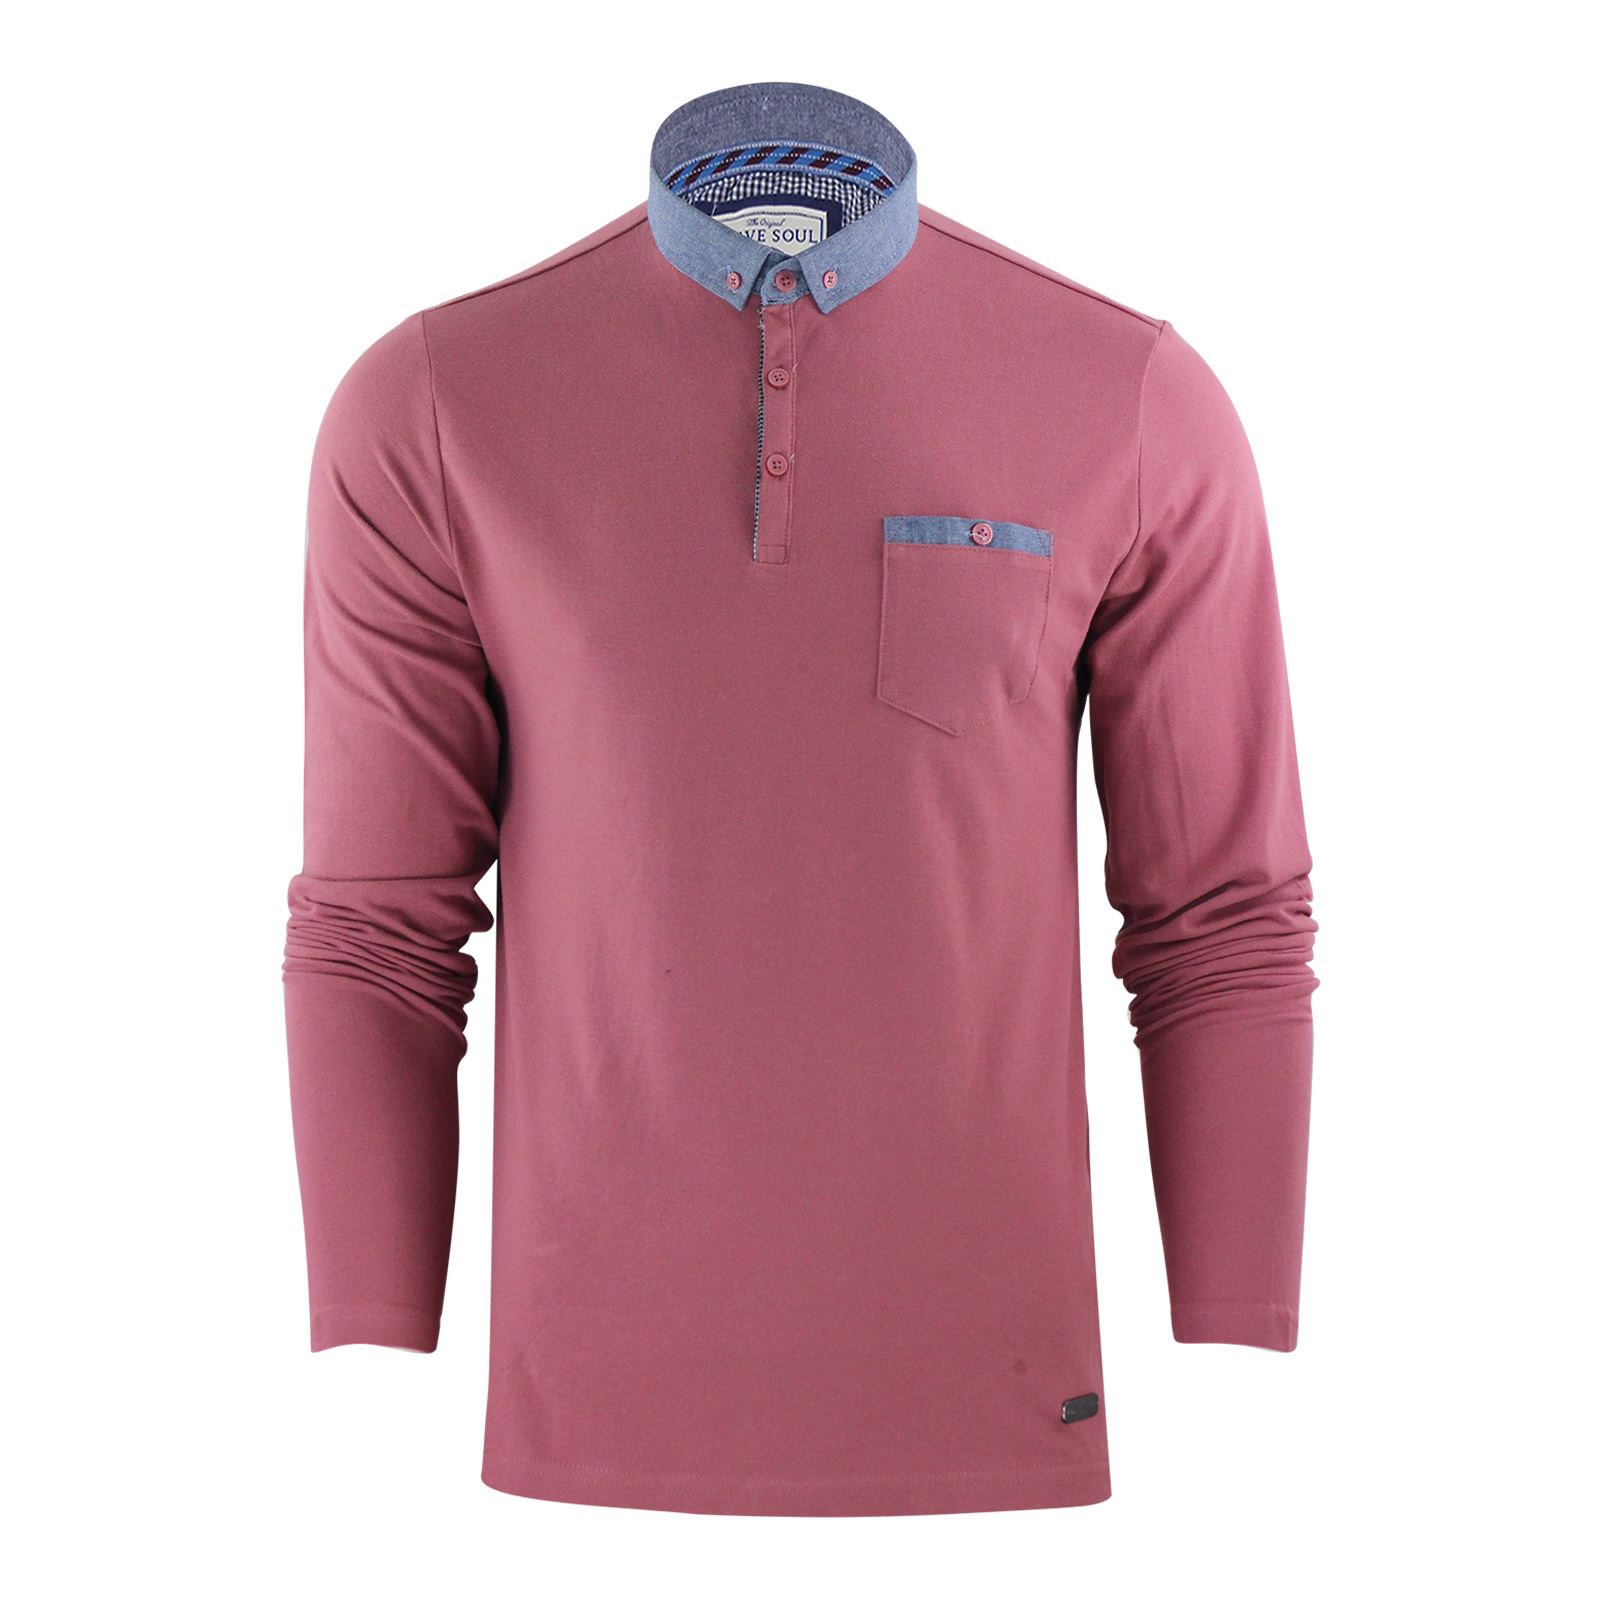 thumbnail 14 - Mens-Polo-T-Shirt-Brave-Soul-Hera-Cotton-Long-Sleeve-Casual-Top